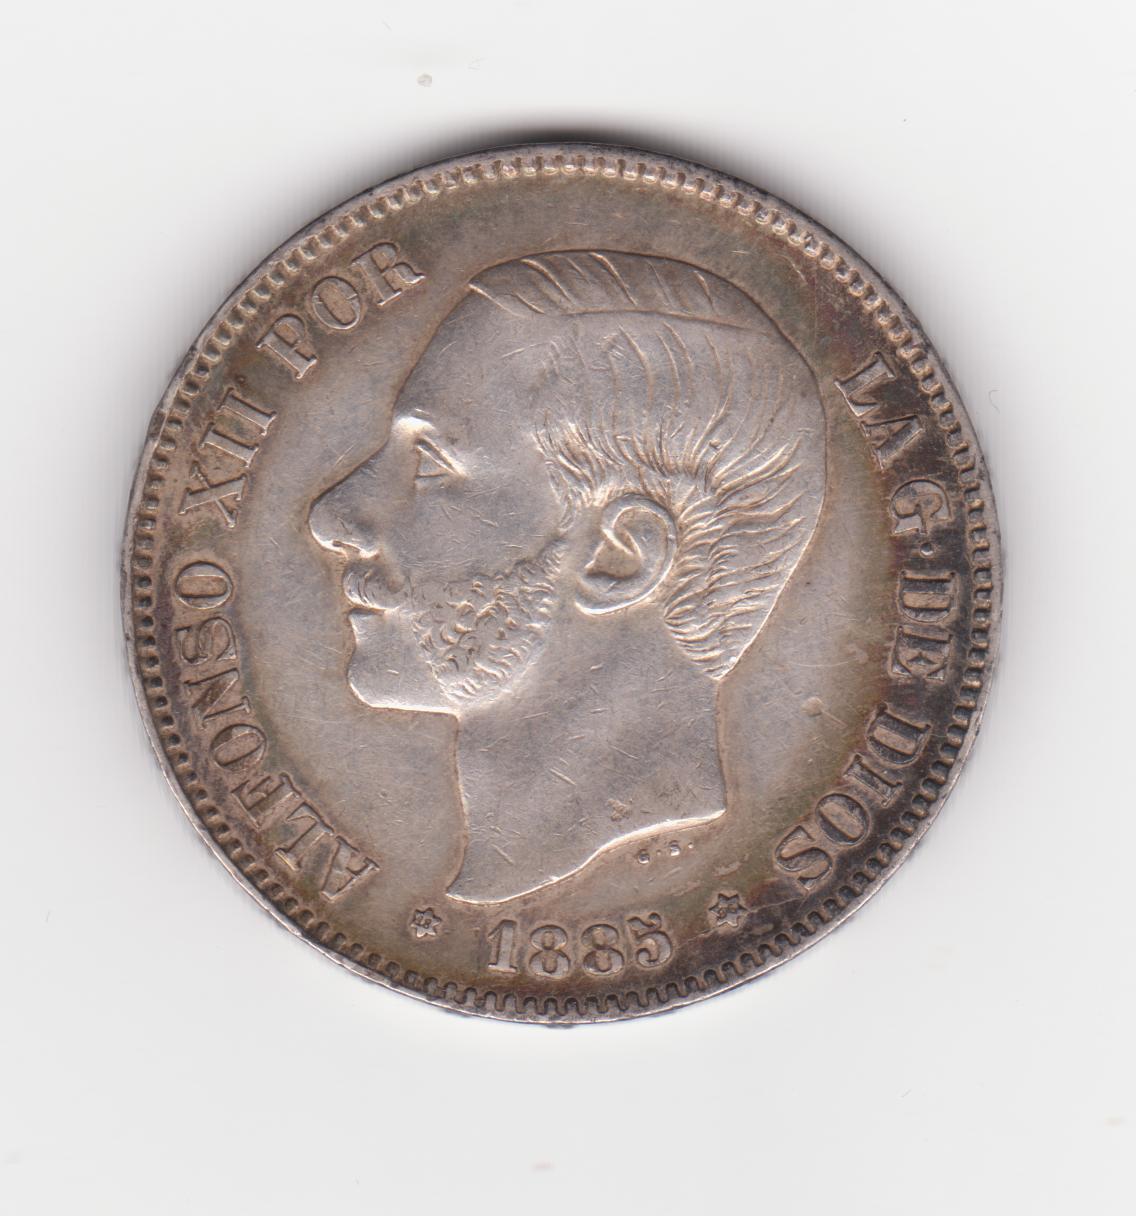 5 pesetas 1885 18*86*, Alfonso XII 5_pesetas_1885